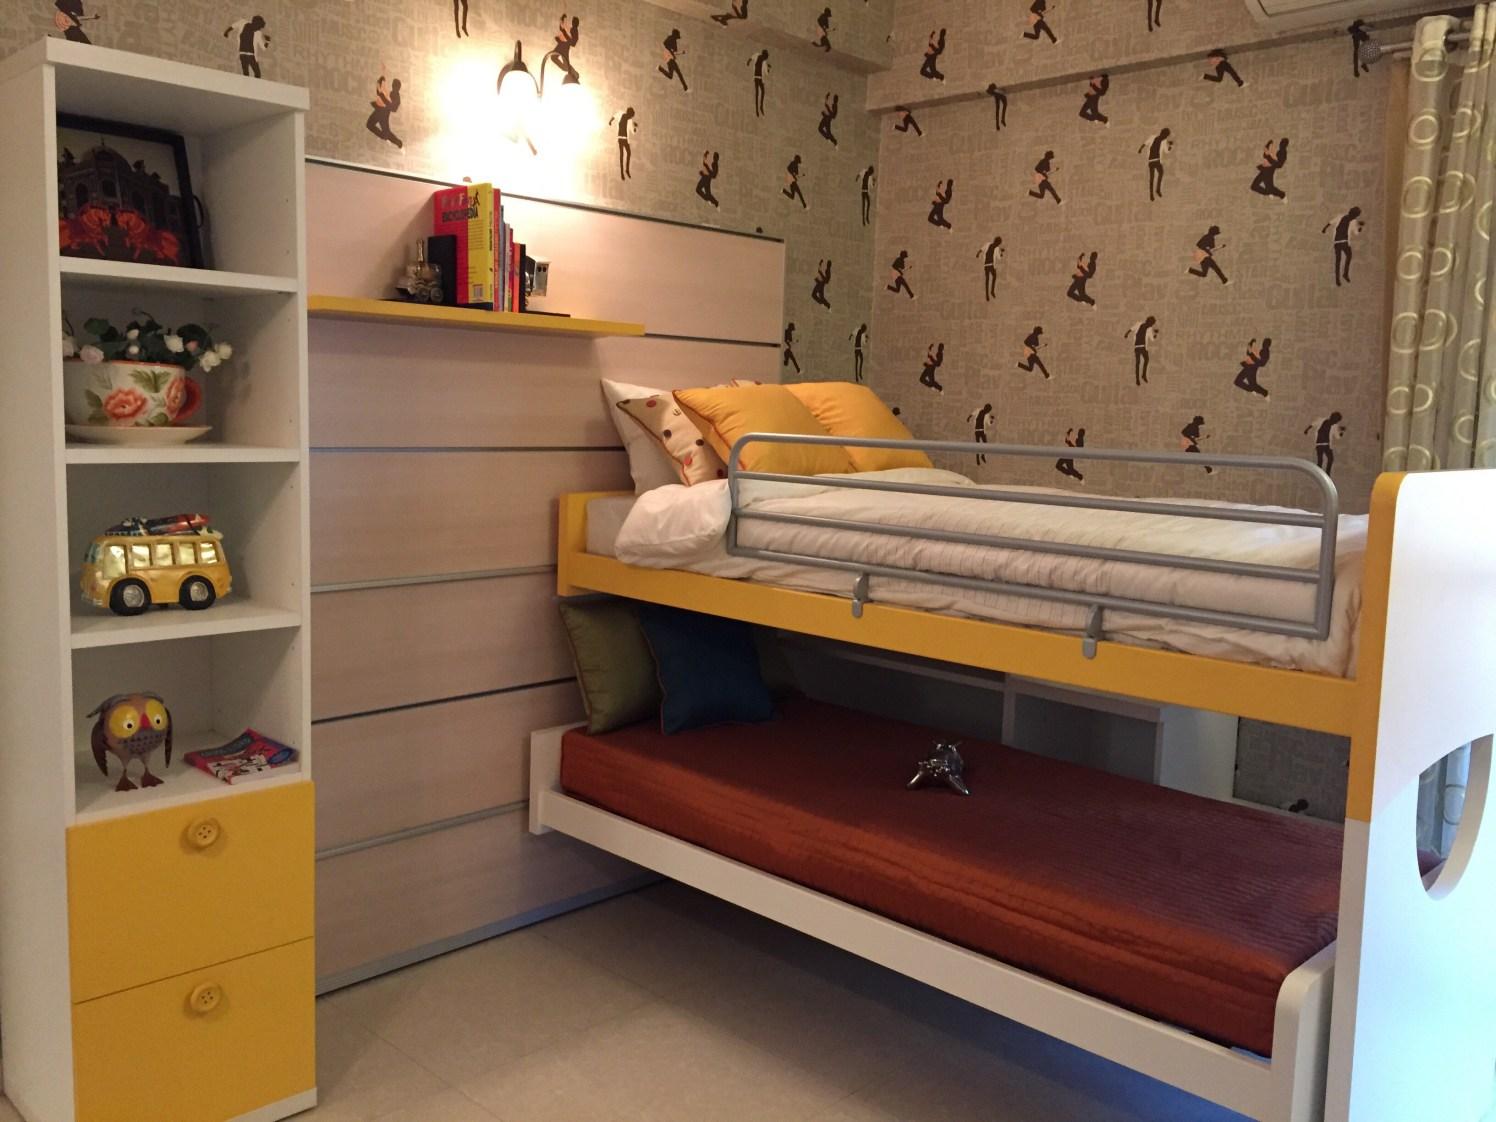 Kids Bedroom by Deepali Garg Modern | Interior Design Photos & Ideas